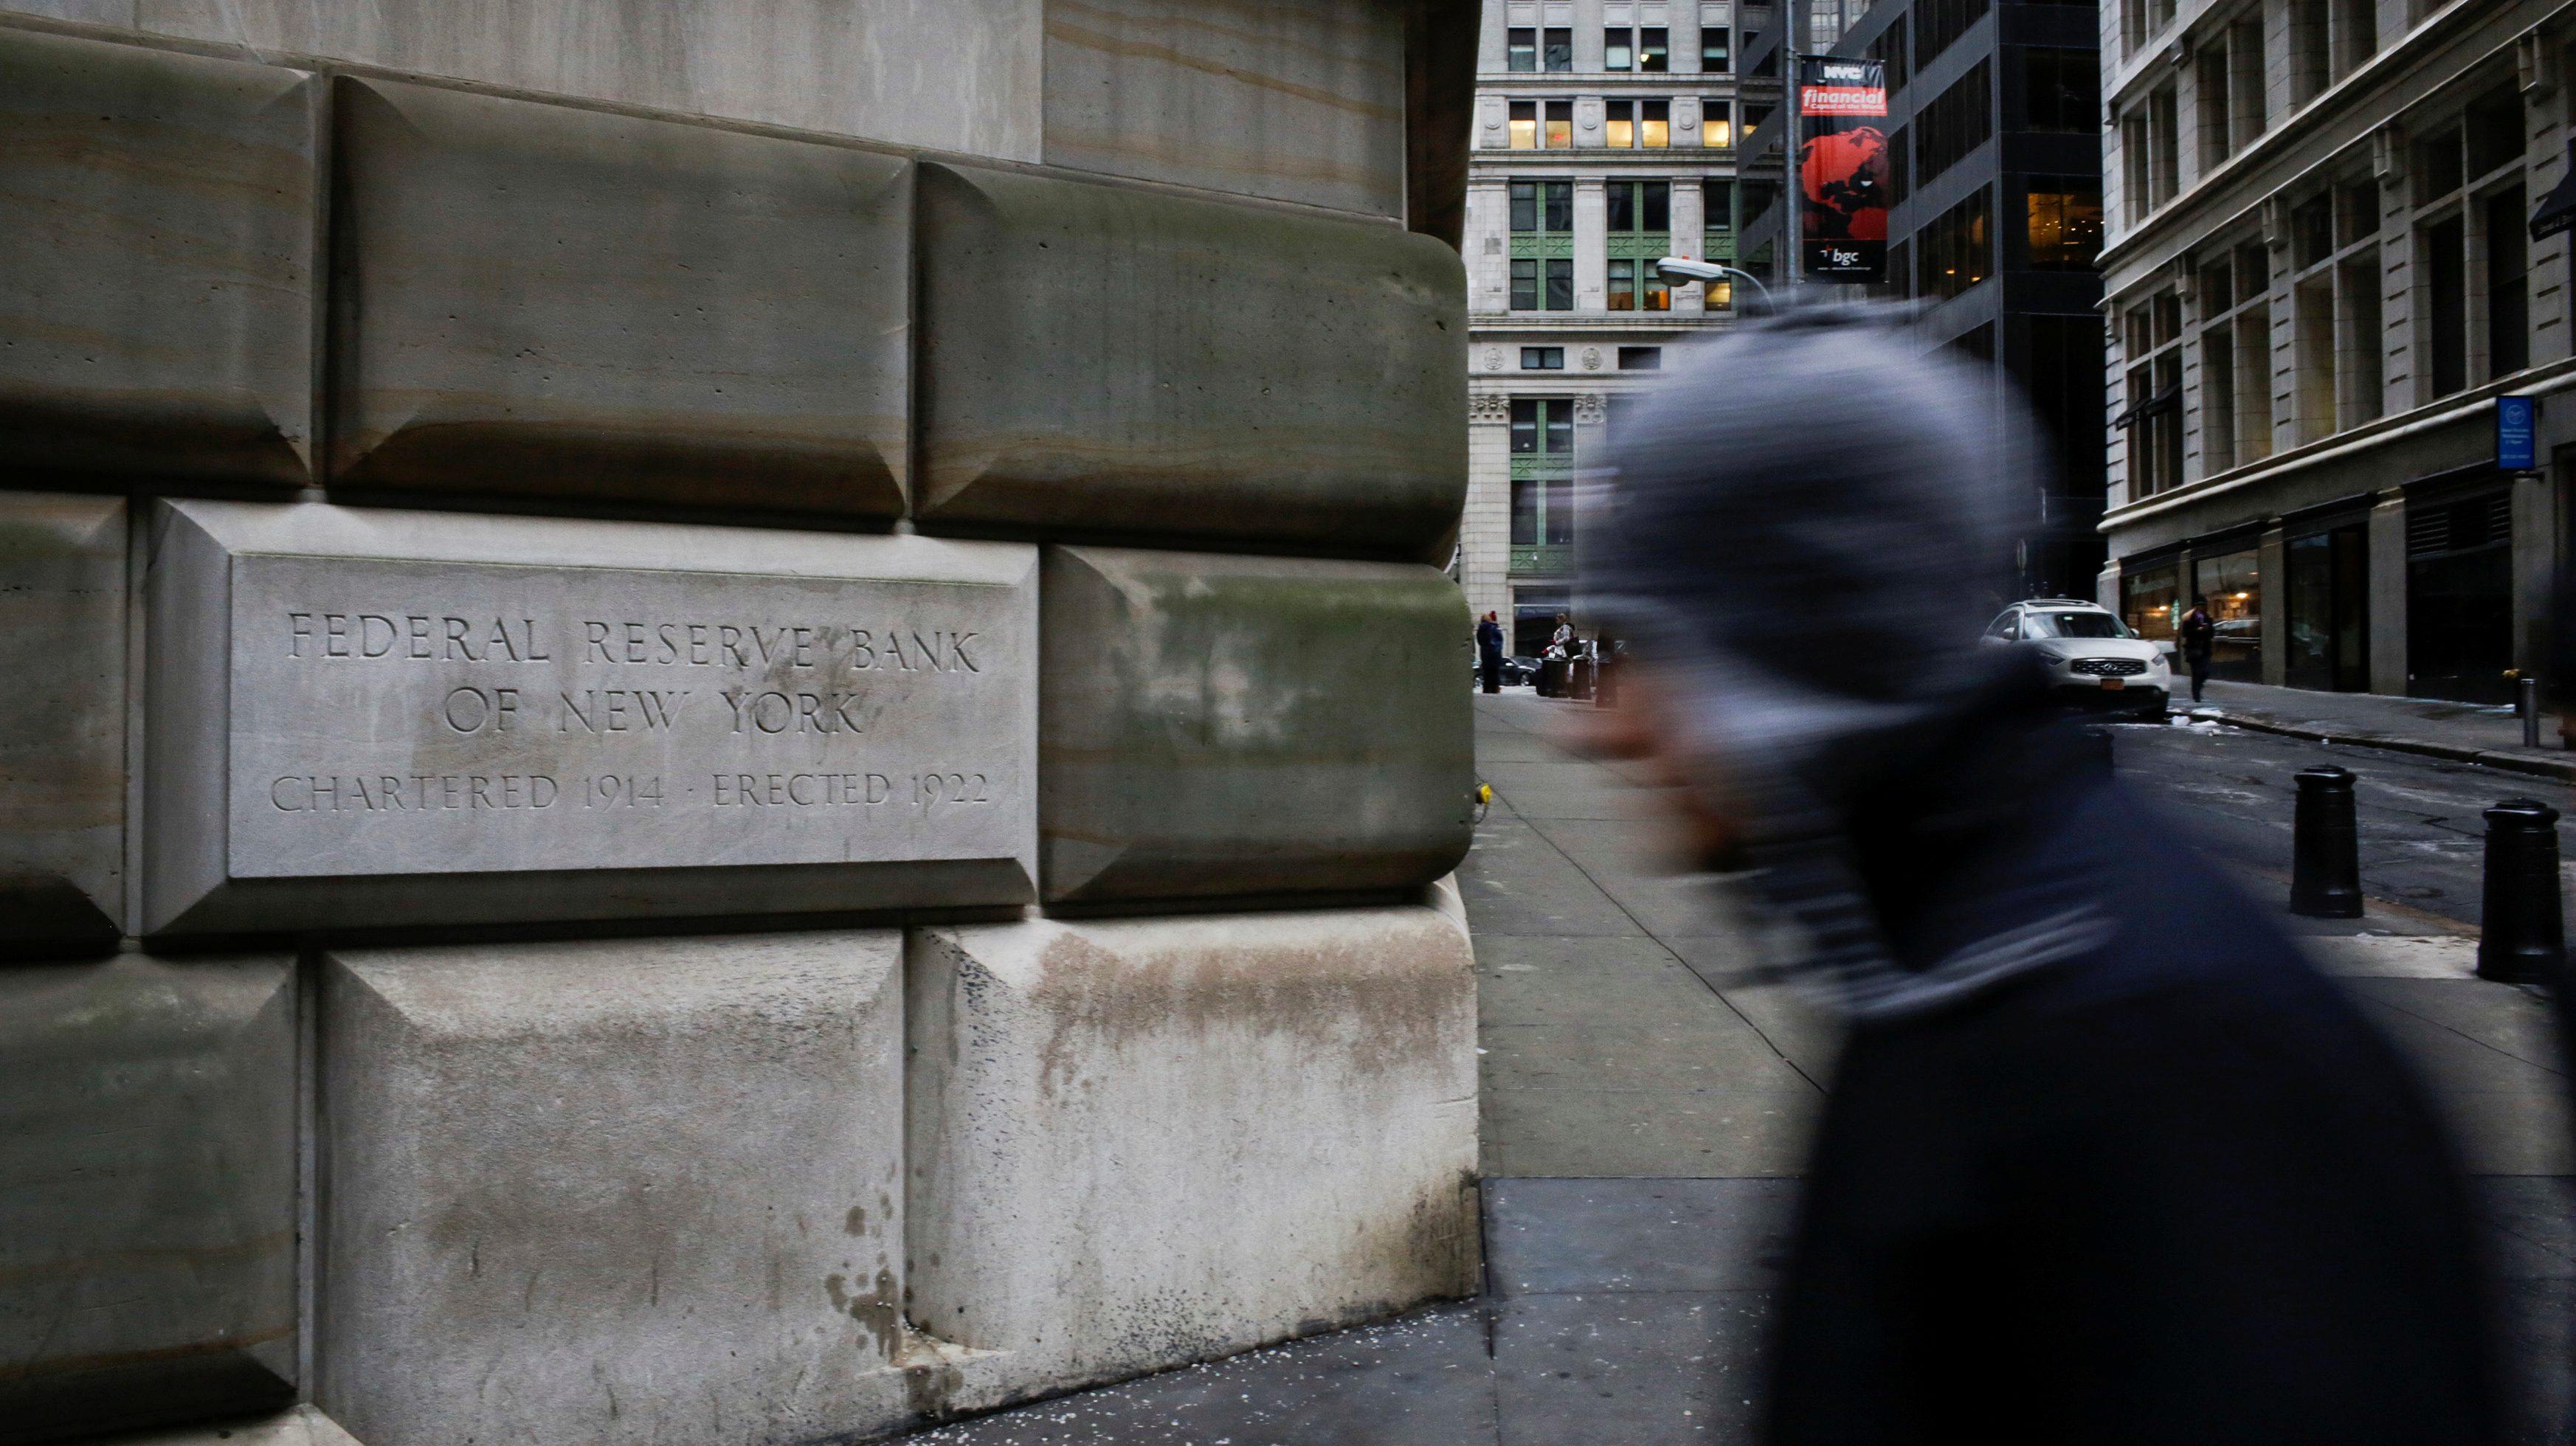 A man walks next to the Federal Reserve Bank of New York in the Manhattan borough of New York, U.S., December 16, 2017.  REUTERS/Eduardo Munoz - RC1EEF8123B0